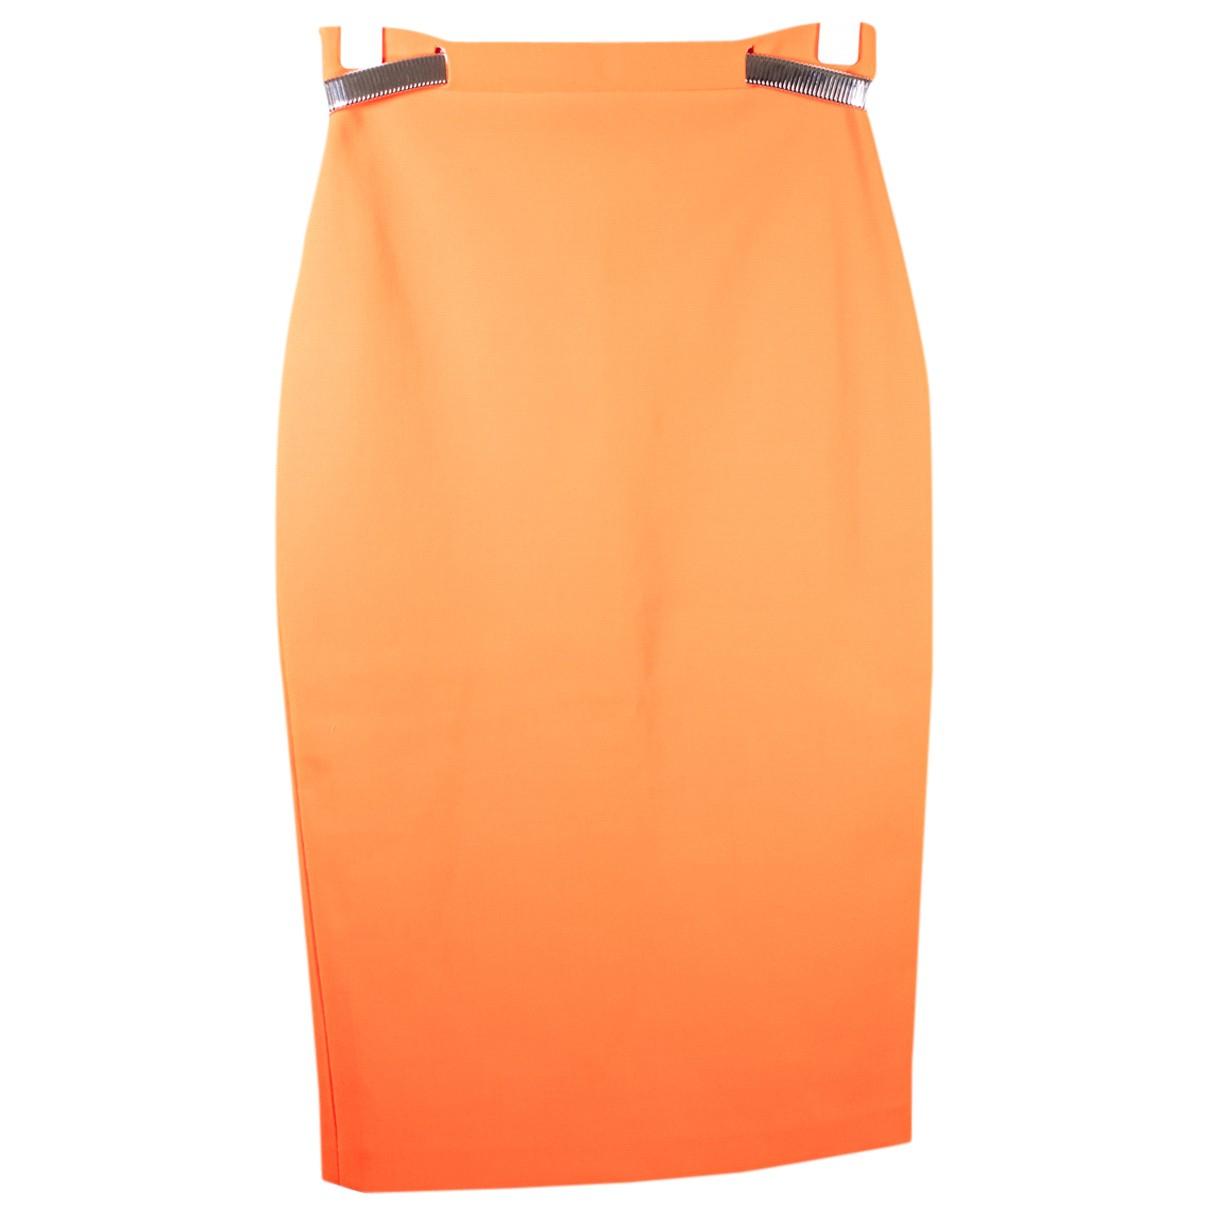 Thierry Mugler - Jupe   pour femme - orange